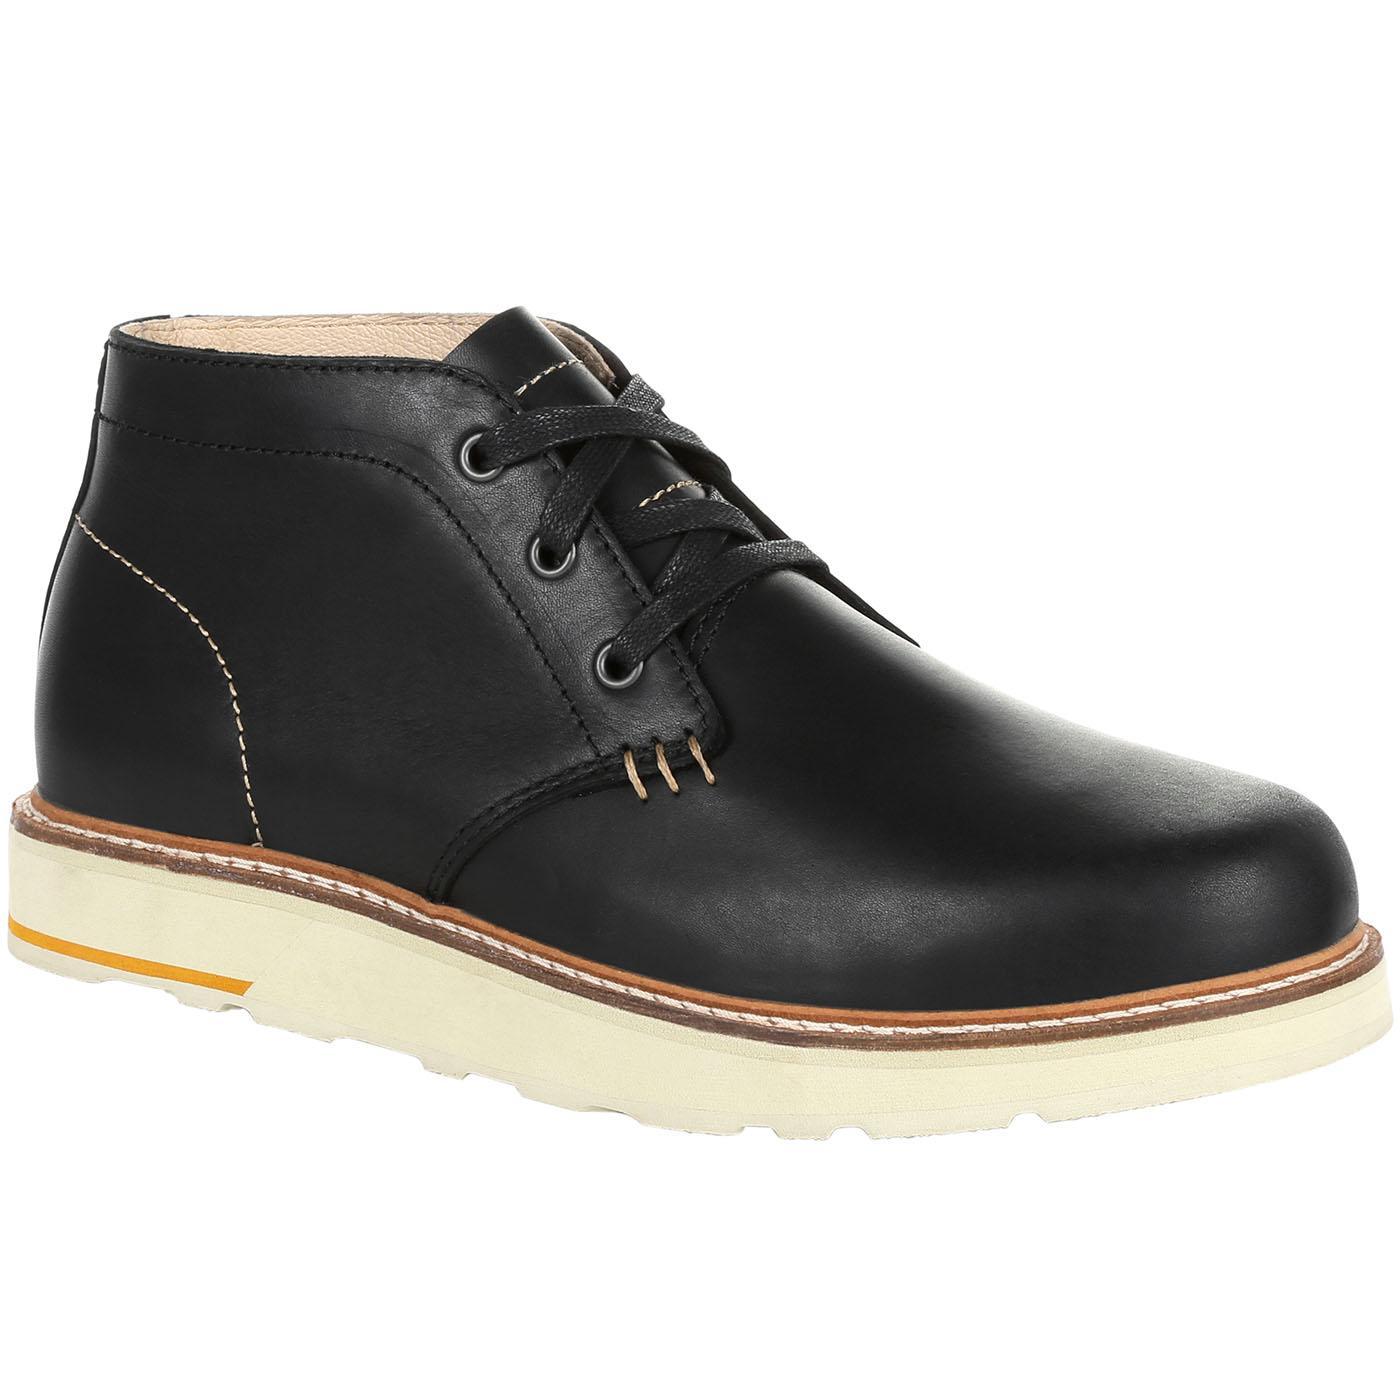 b1adf3f860ad1 Georgia Boot Small Batch Black Chukka Boot